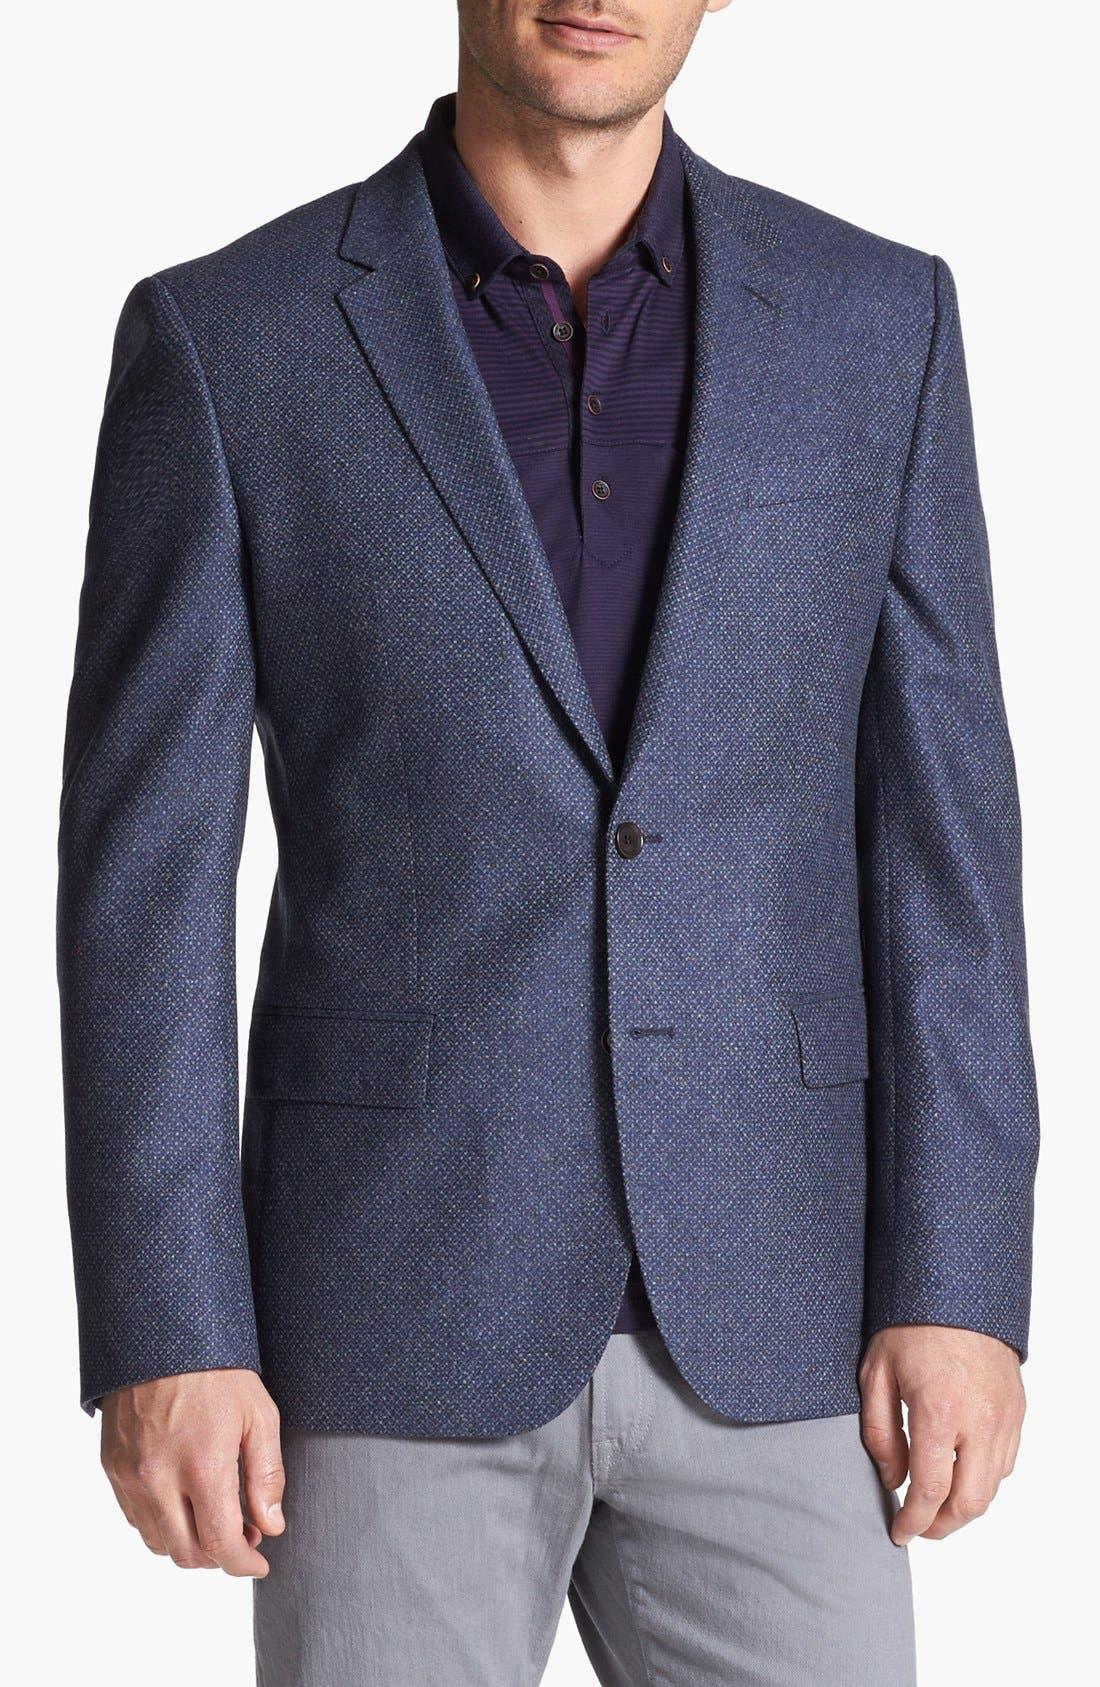 Alternate Image 1 Selected - BOSS HUGO BOSS 'Hutch' Trim Fit Sportcoat